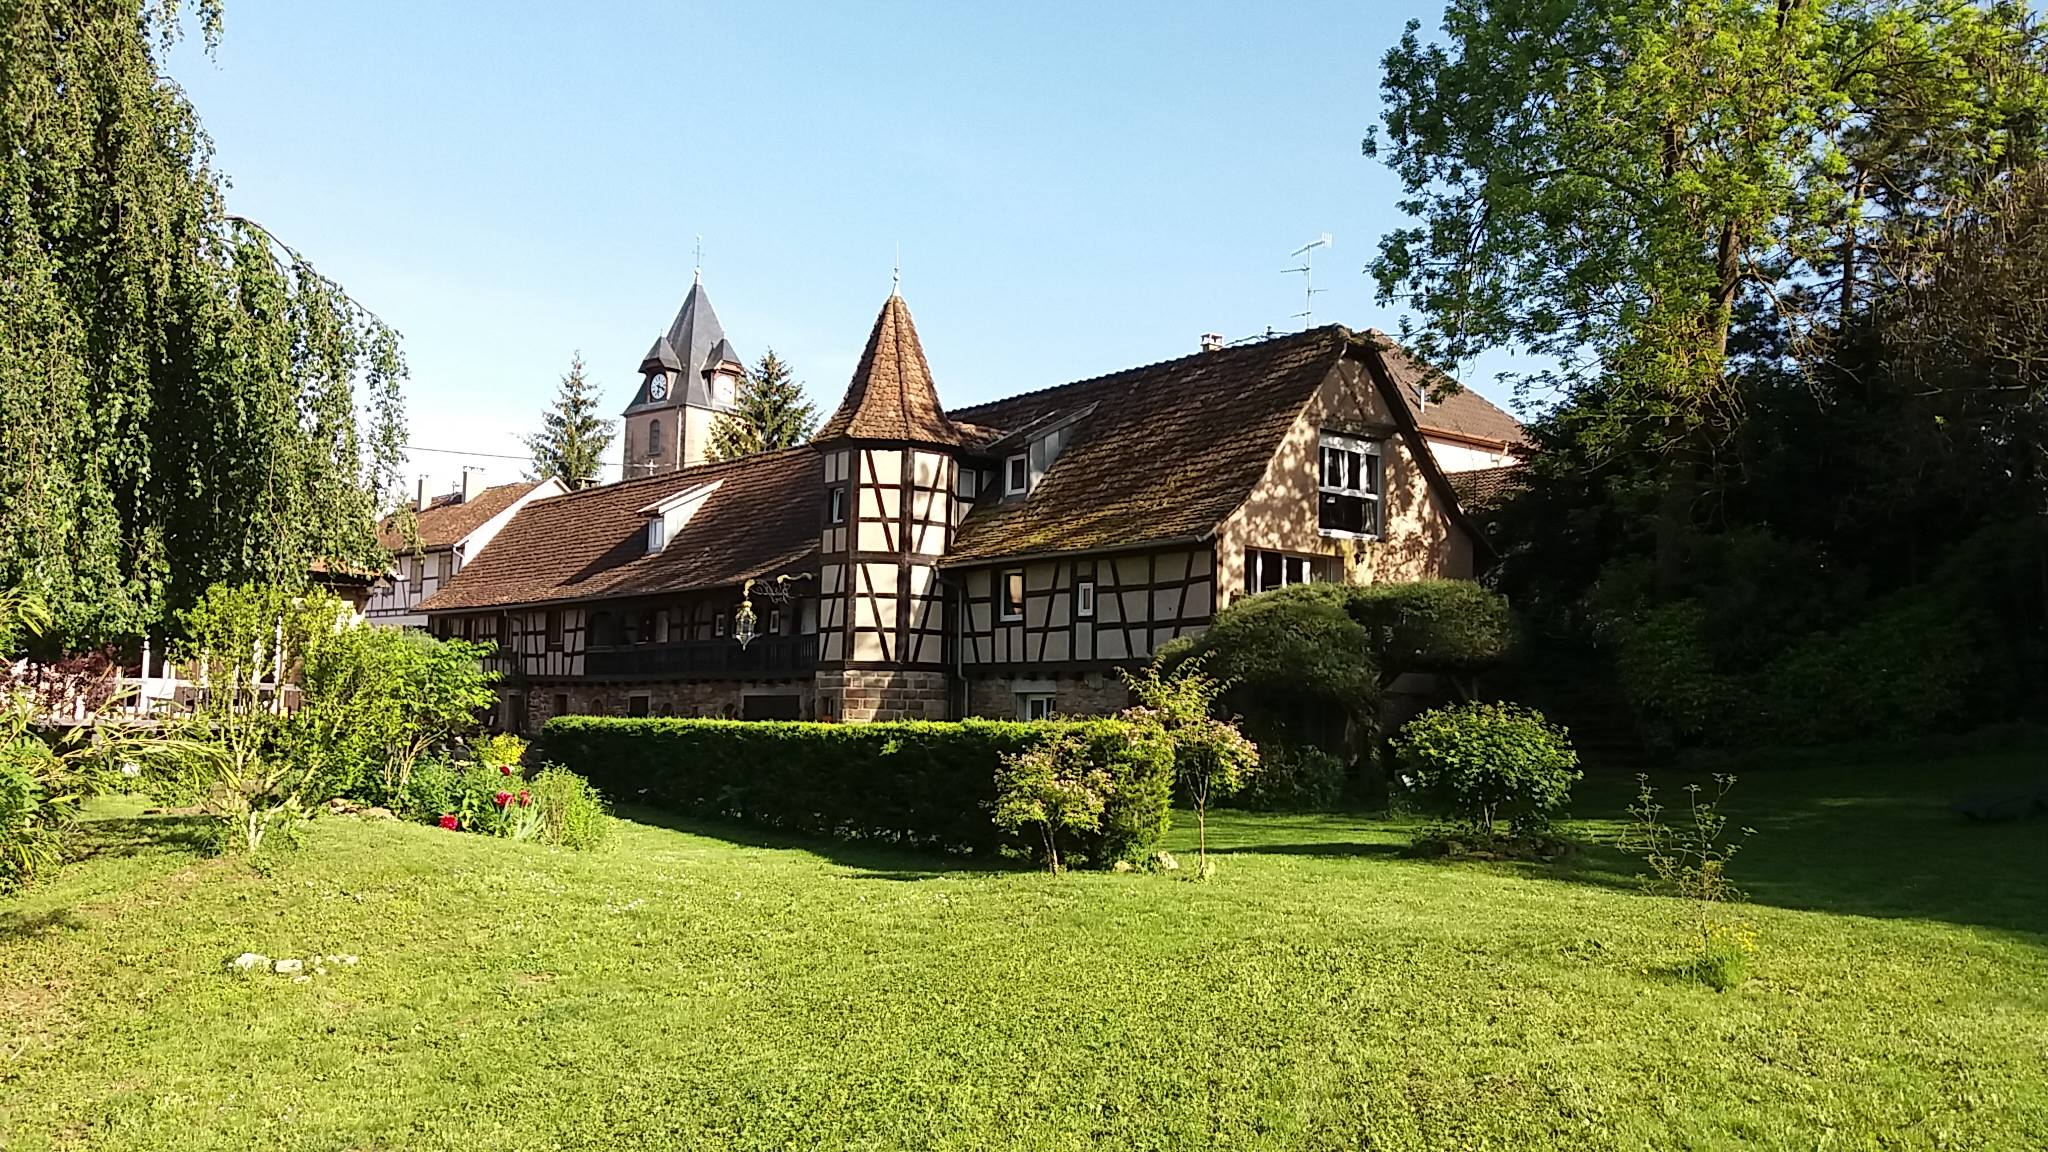 Chambres d'hôtes La Tourelle de Mithra - Maidele (Neugartheim Ittlenheim)